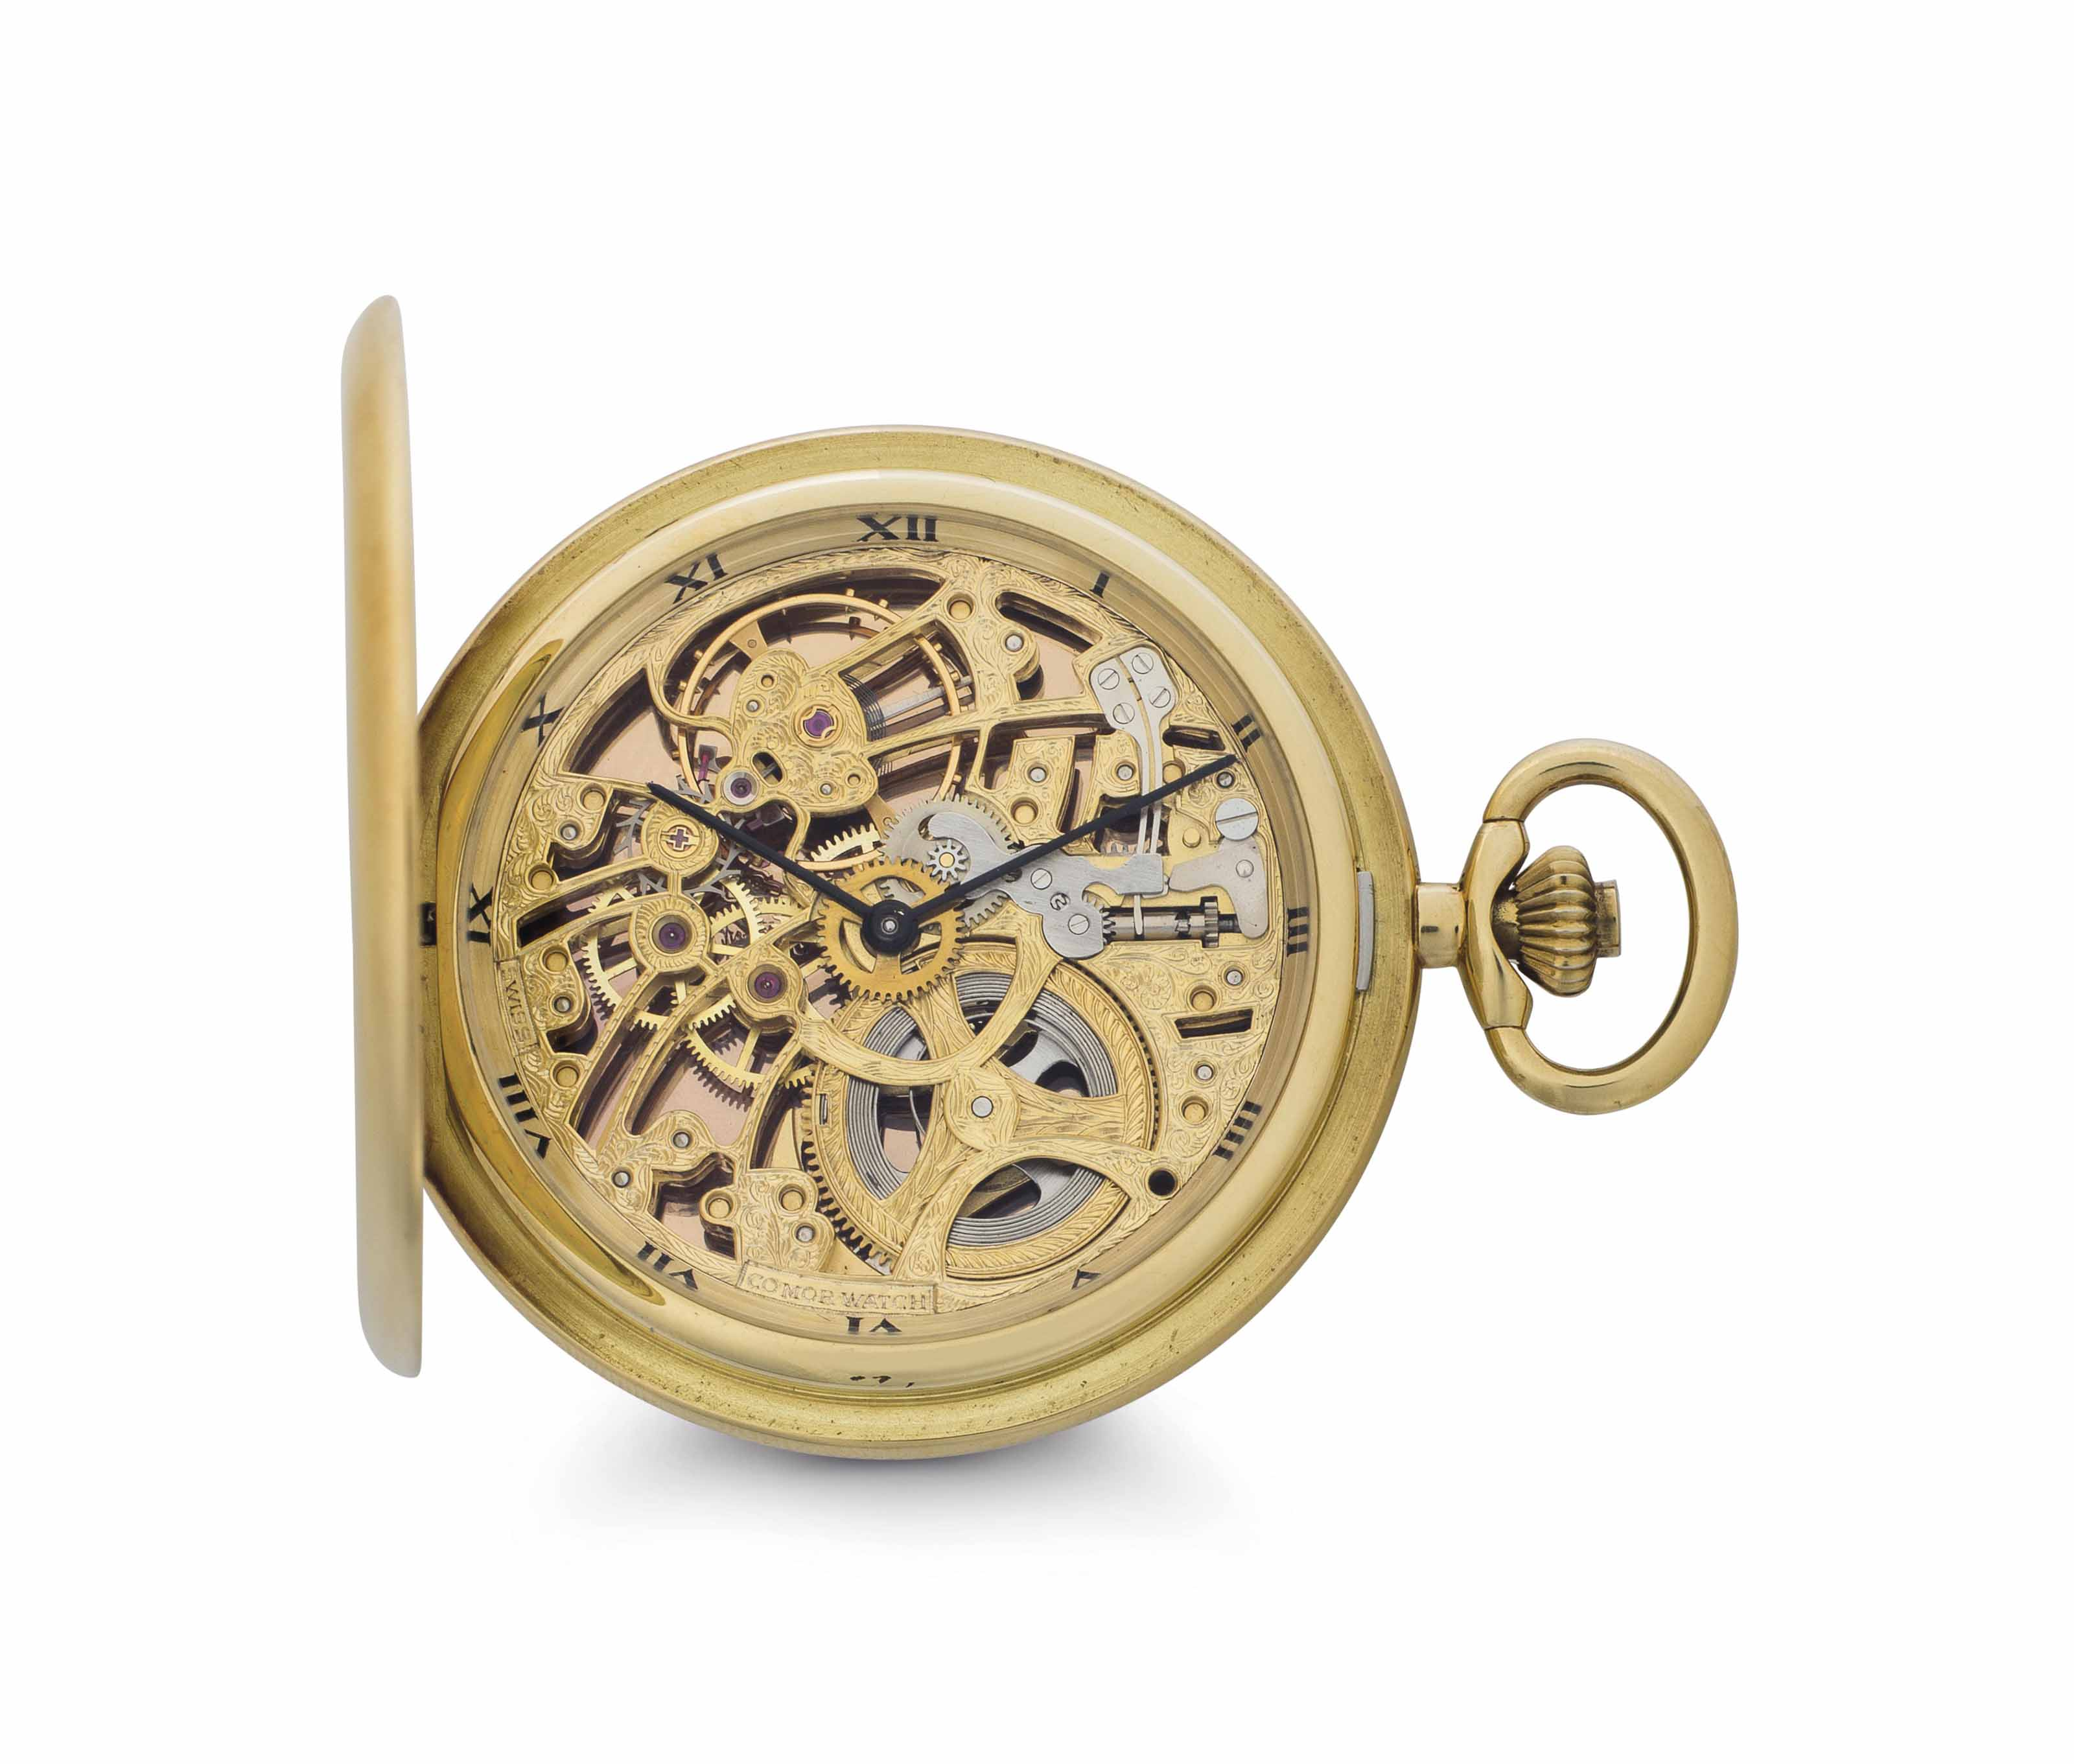 Comor. An 18k Gold Skeletonized Hunter Case Keyless Lever Pocket Watch